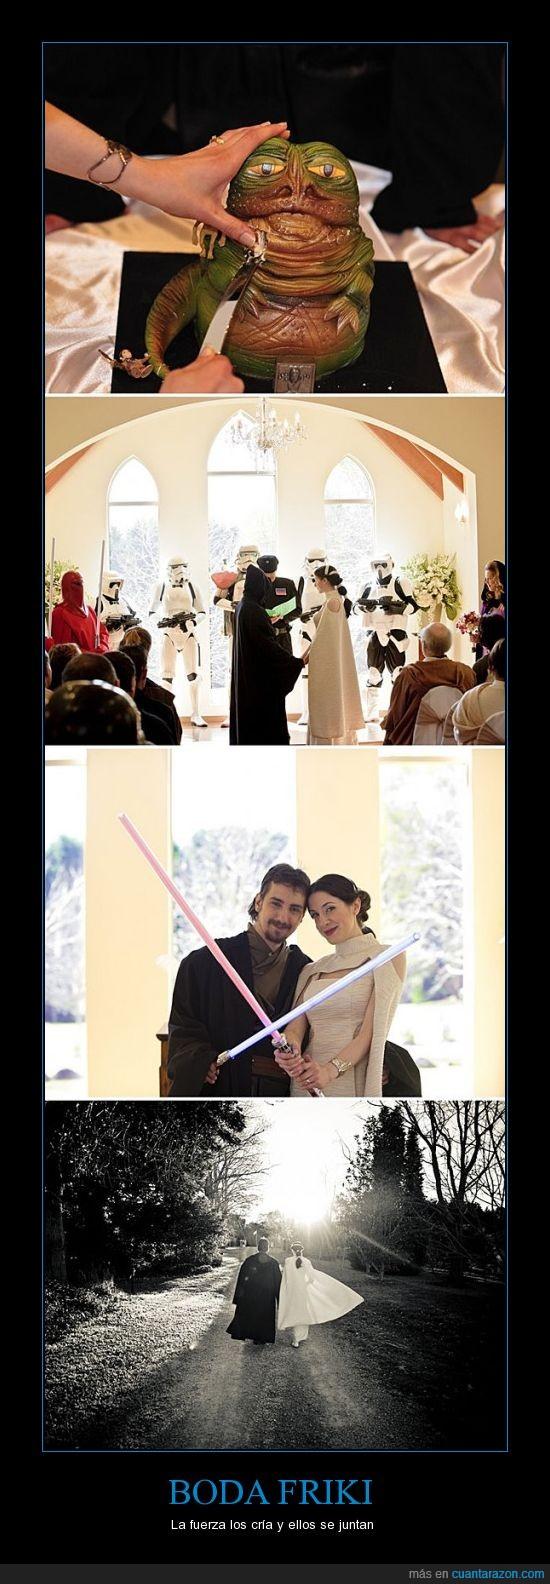 boda,friki,jabba,laser,pastel,sable,star wars